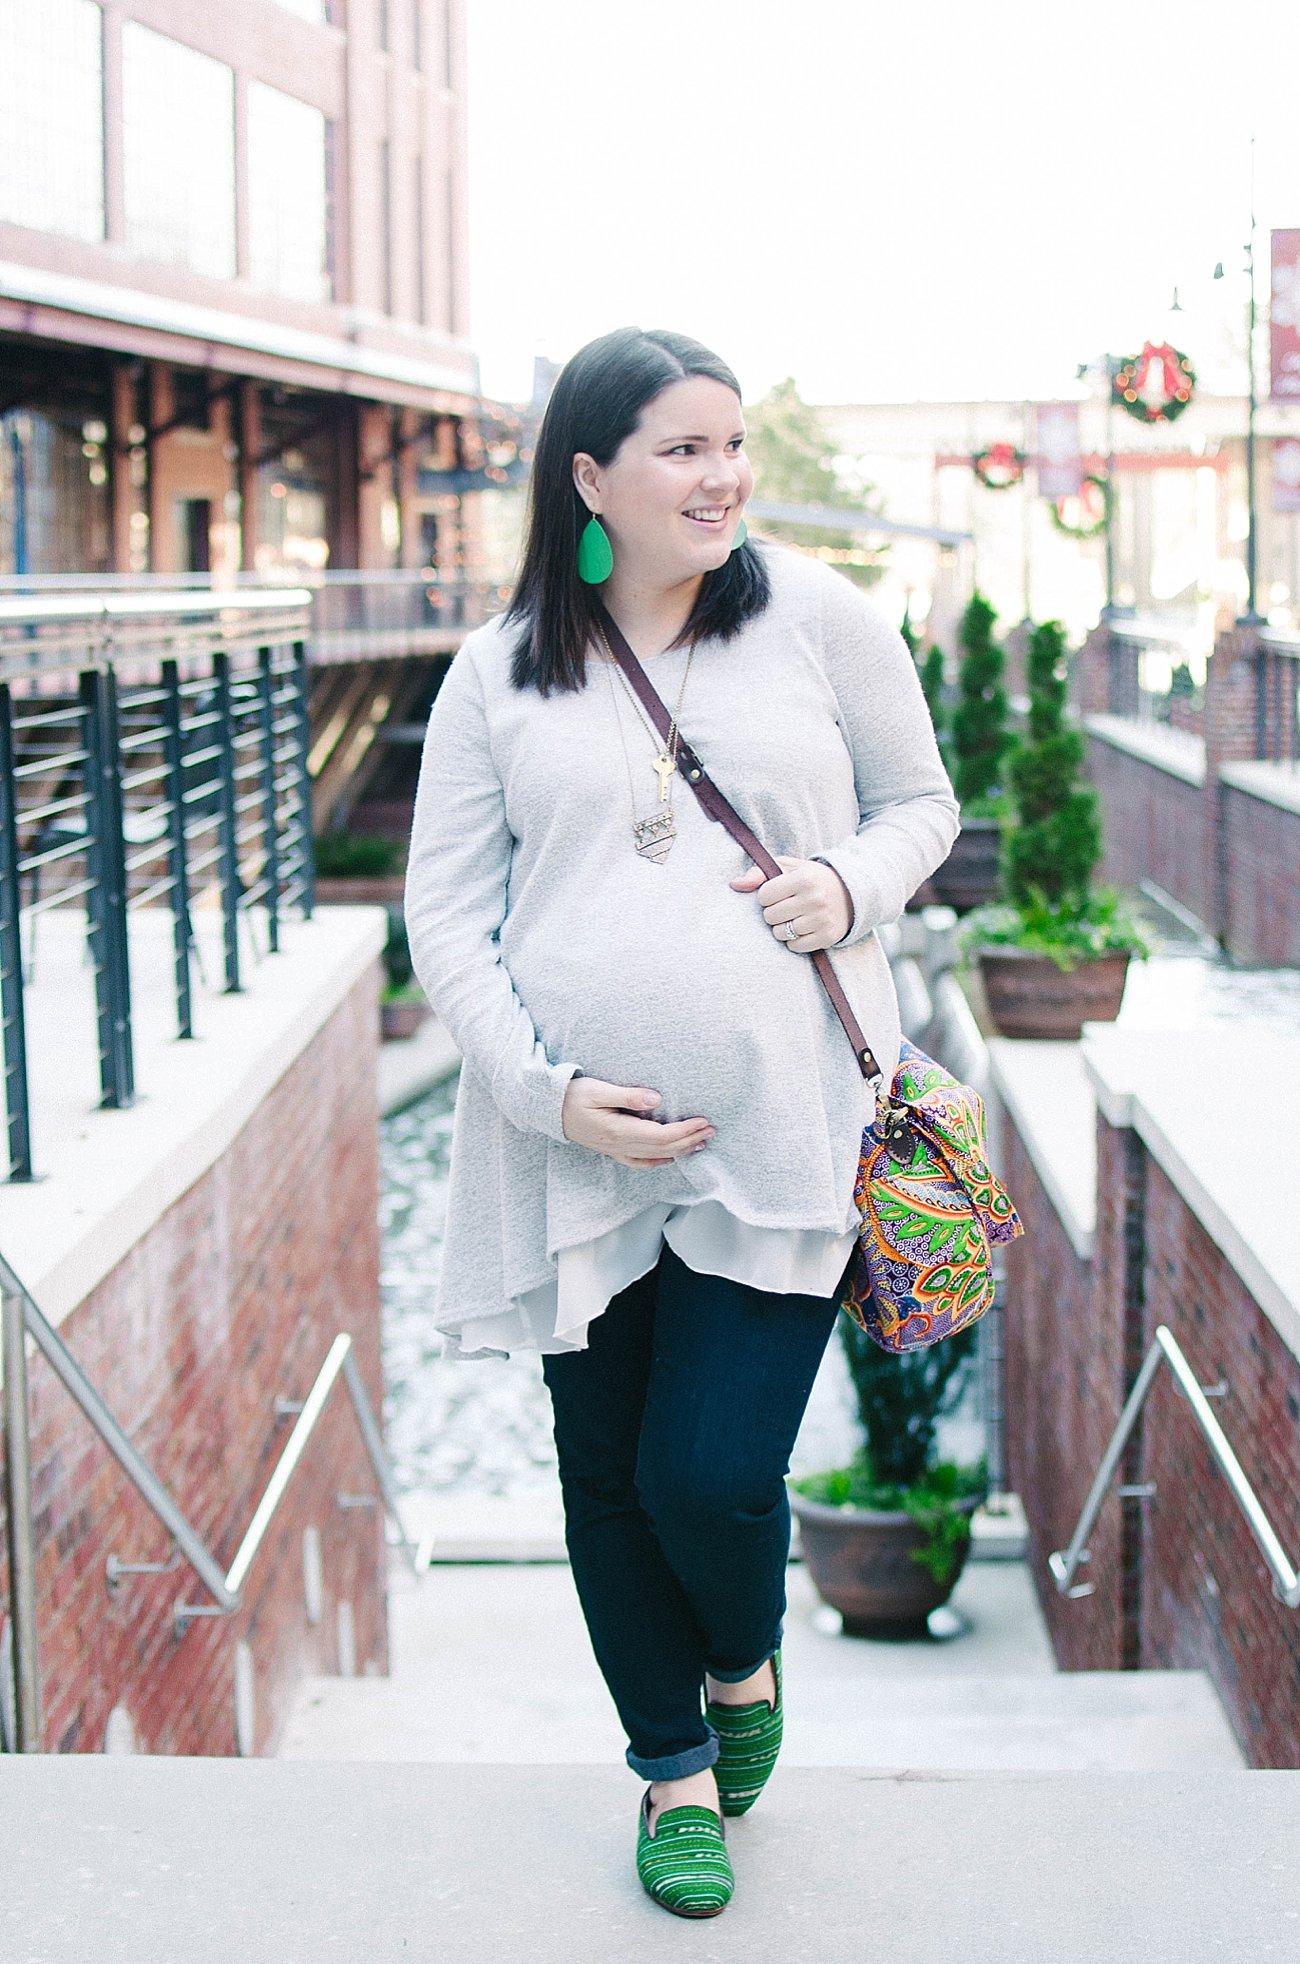 Pinkblush Maternity tunic and Nena & Co. loafers - Maternity style